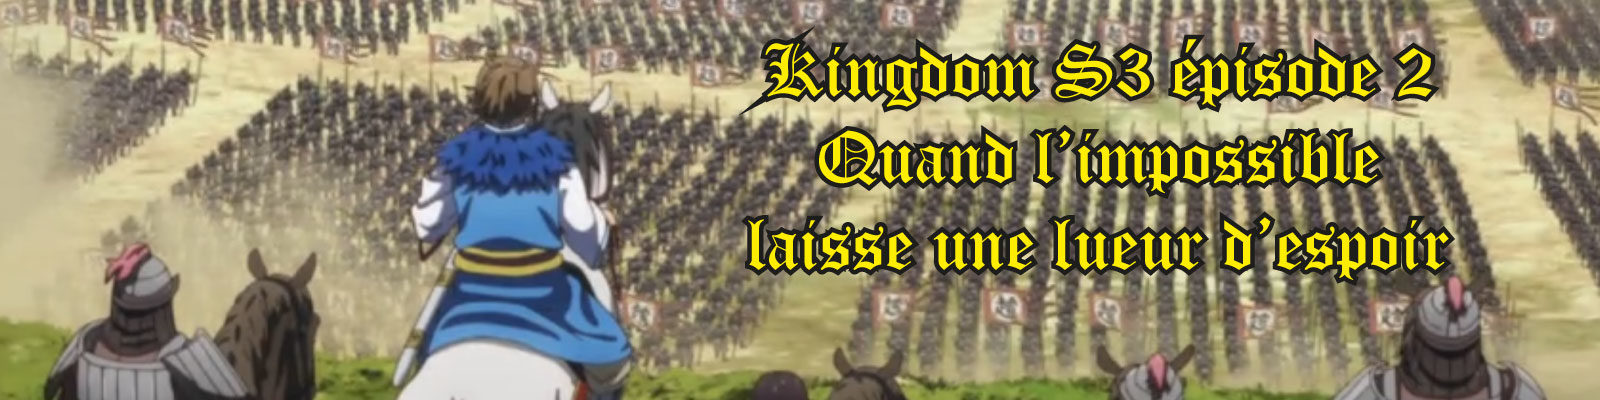 Kingdom-1-1